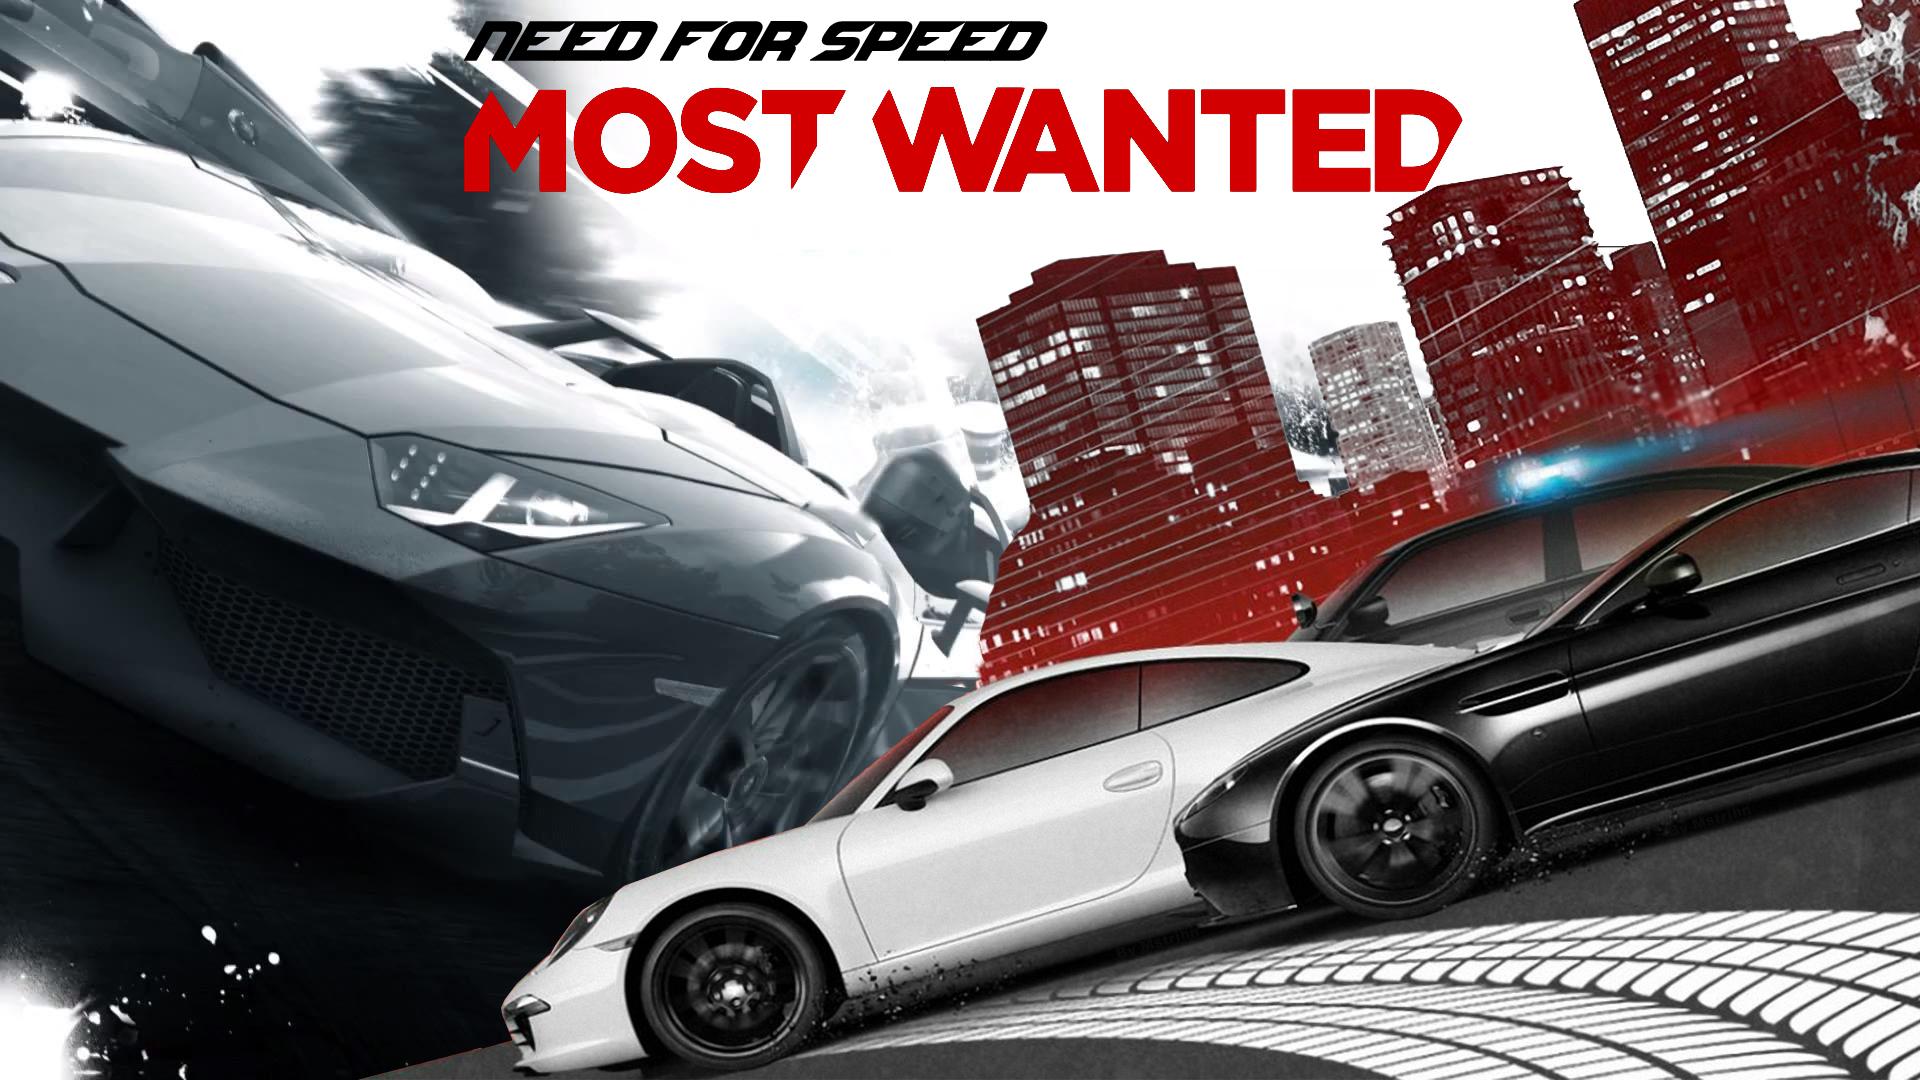 [Аккаунт] Need for Speed: Most Wanted + (Секретный вопрос)